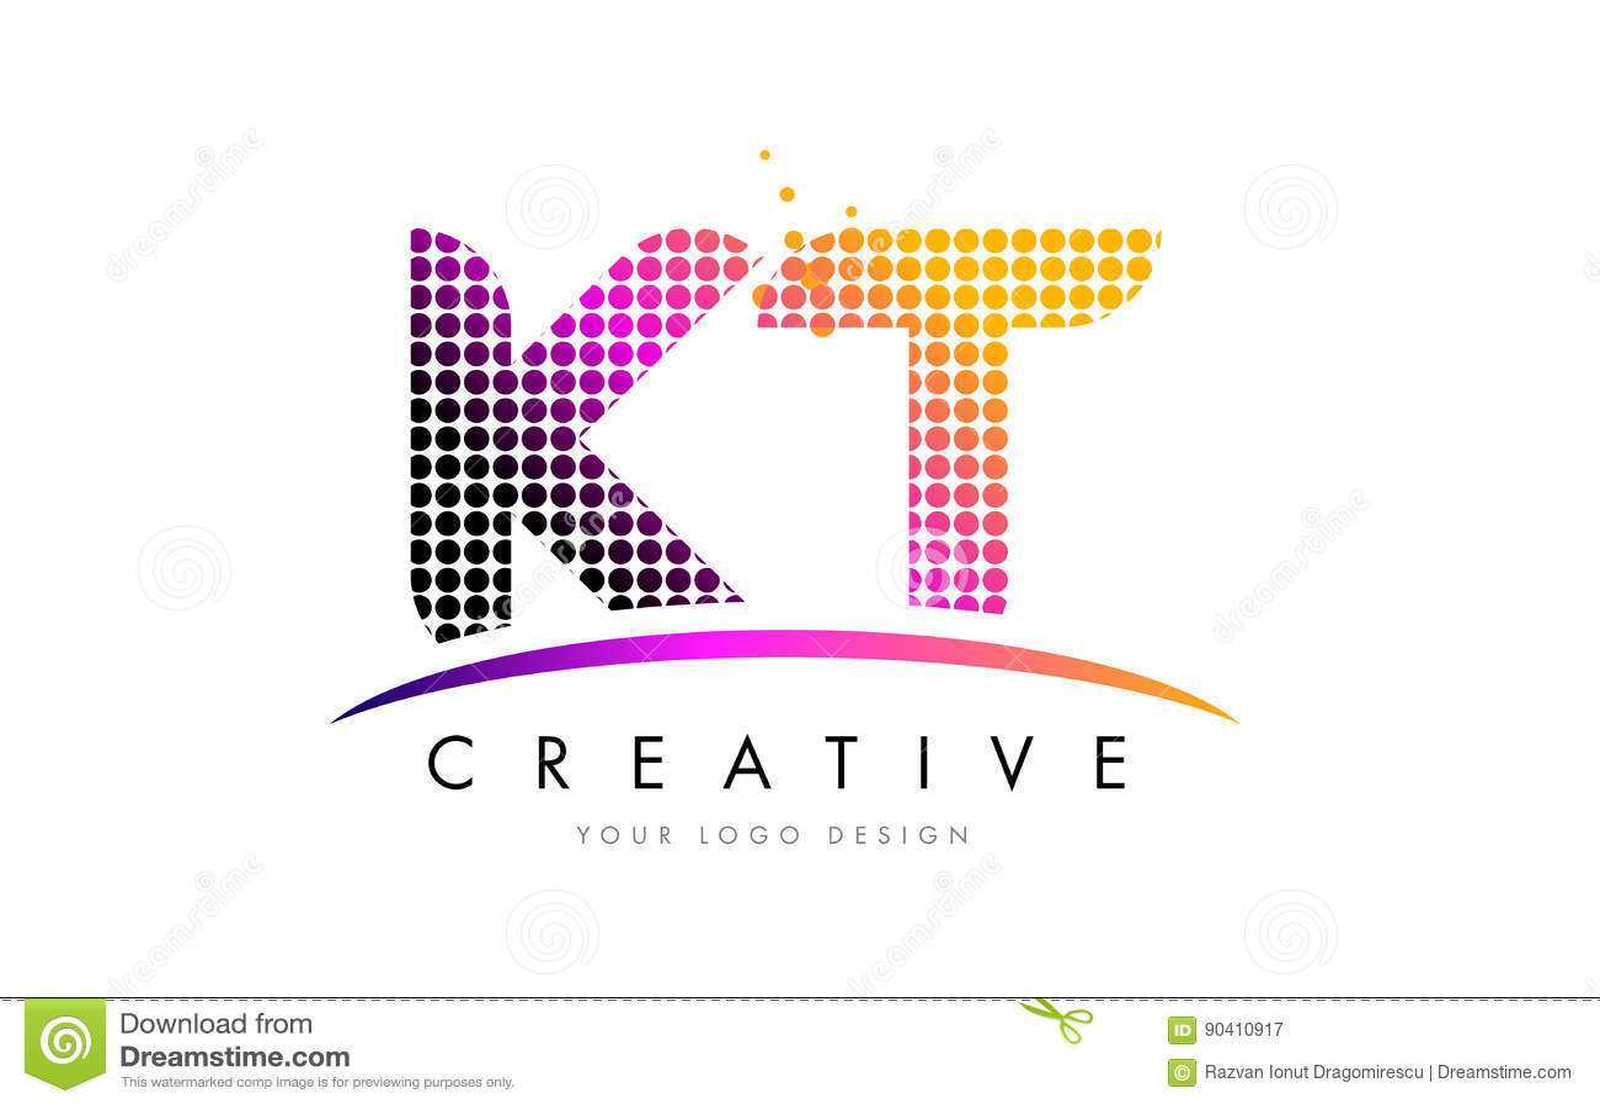 KT K T Letter Logo Design with Magenta Dots and Swoosh